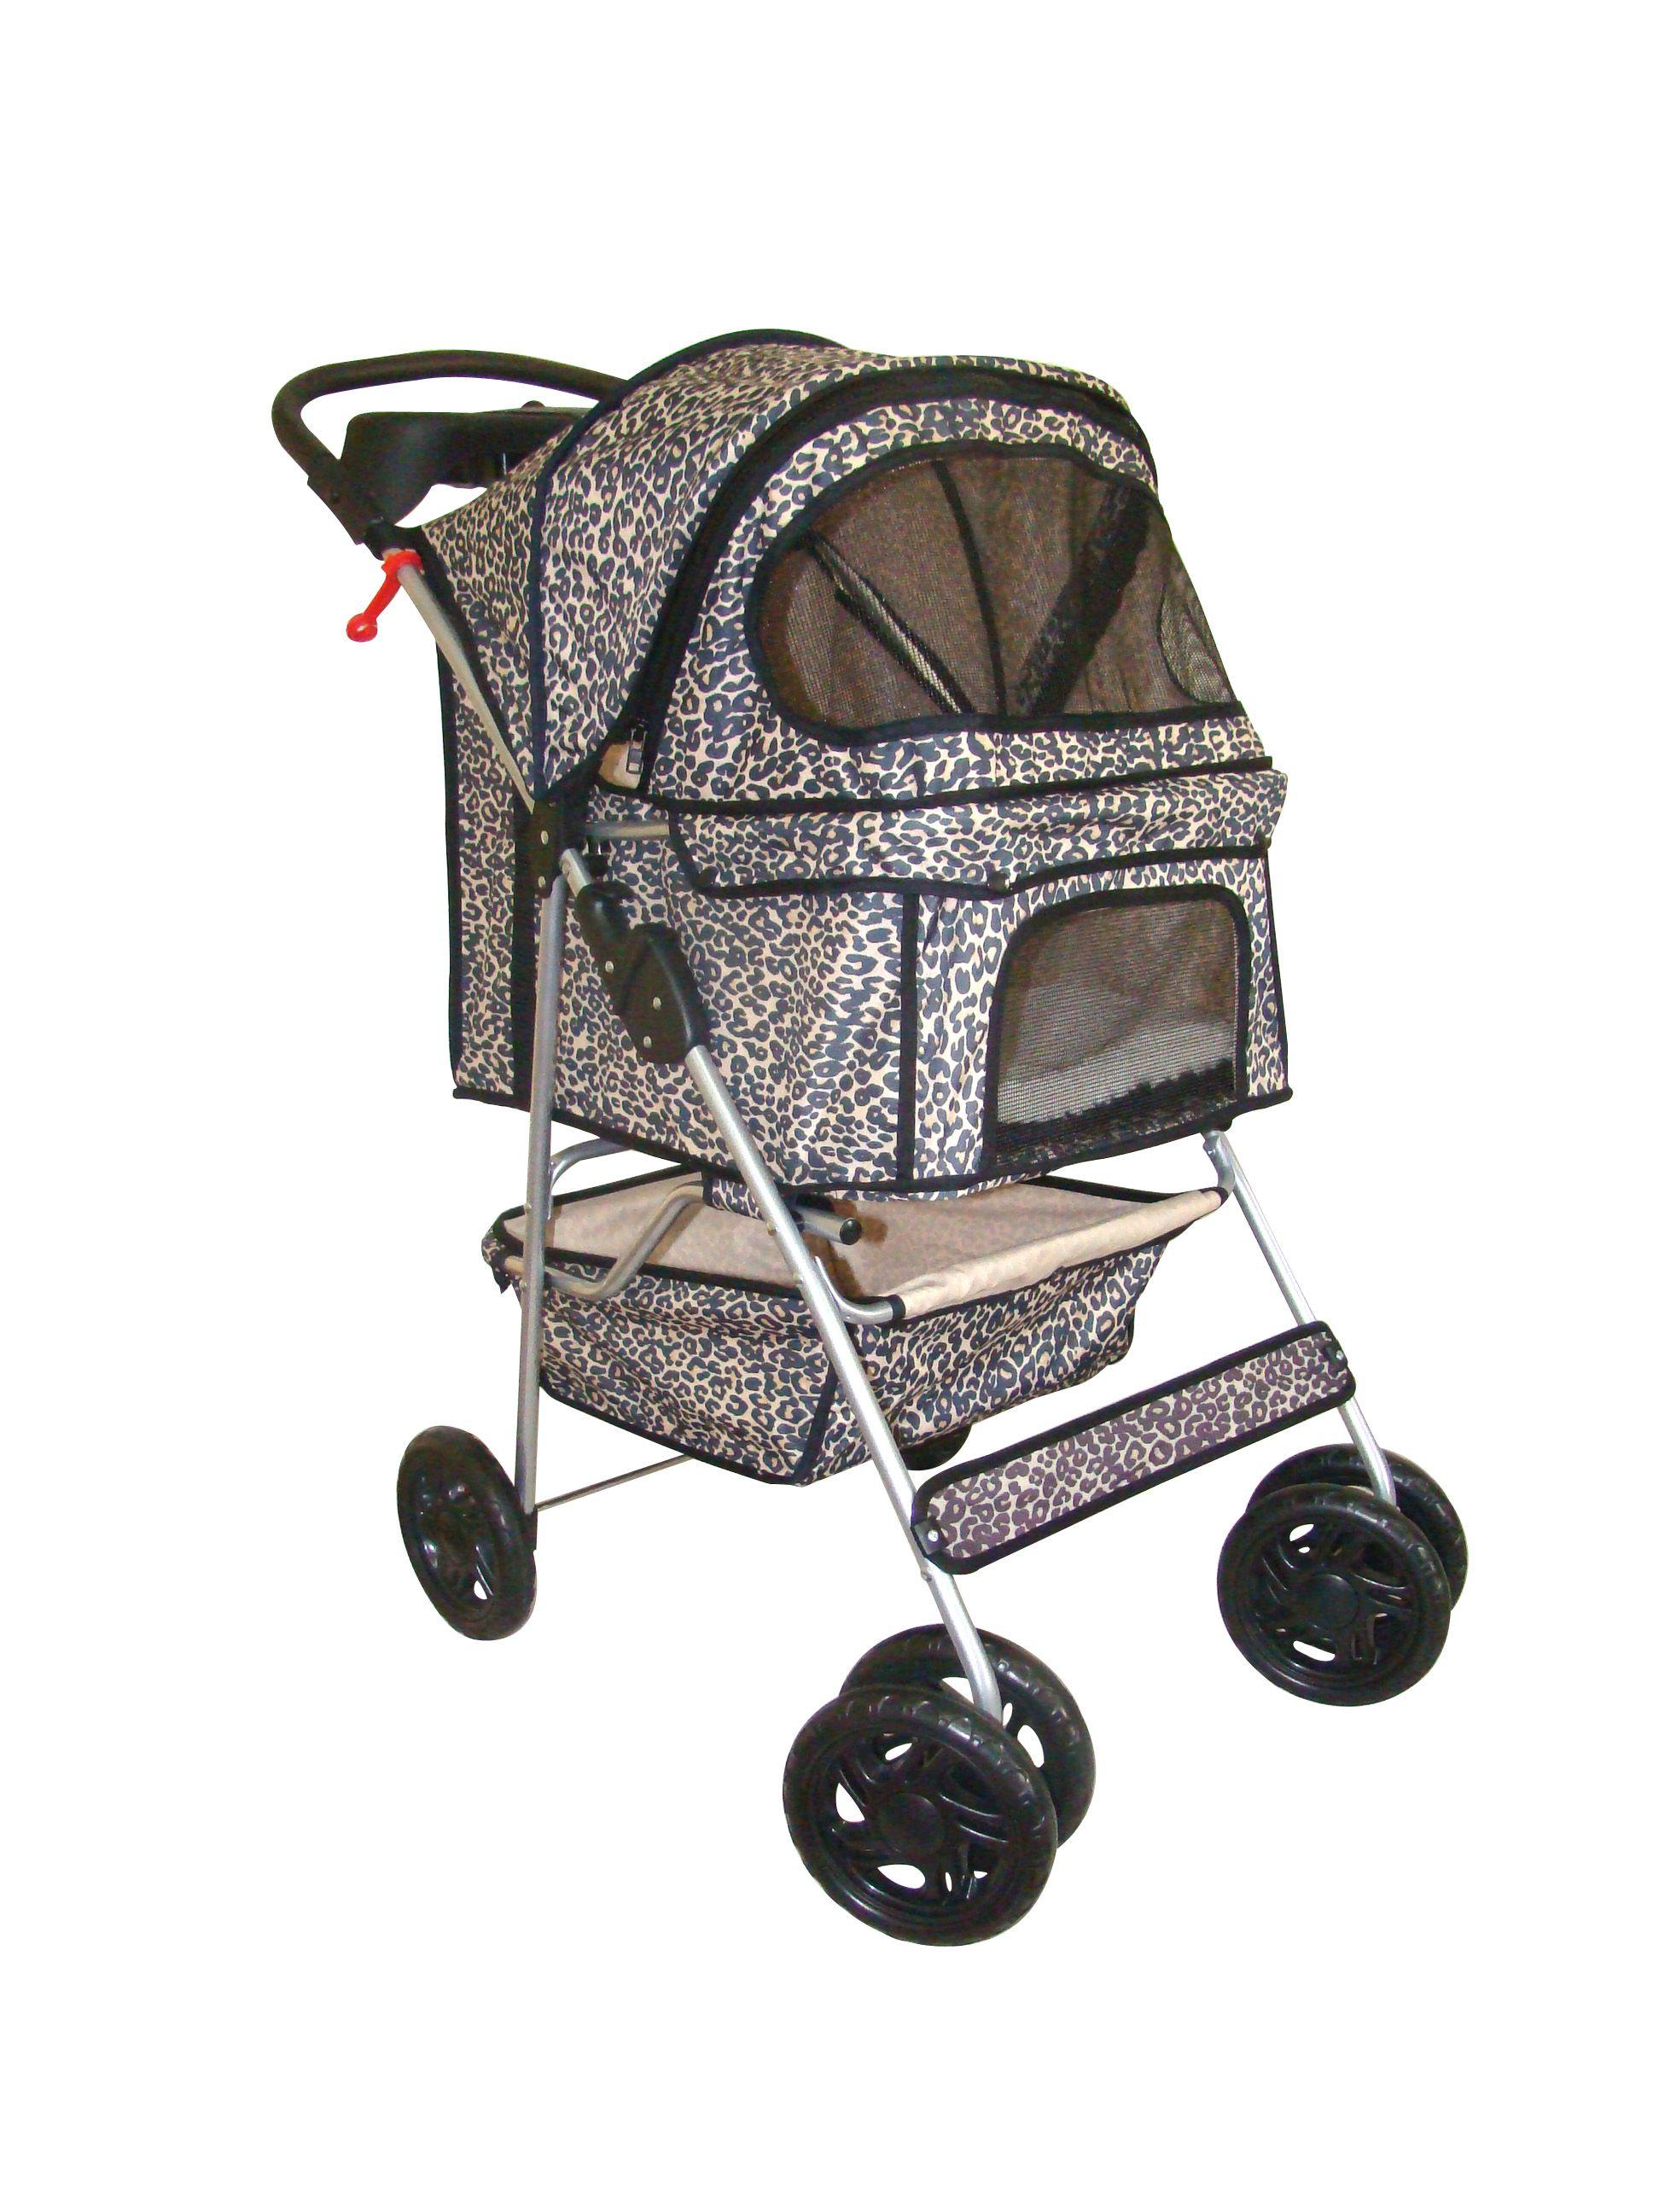 combo pet stroller, carrier & car seat | pet stroller, car seats